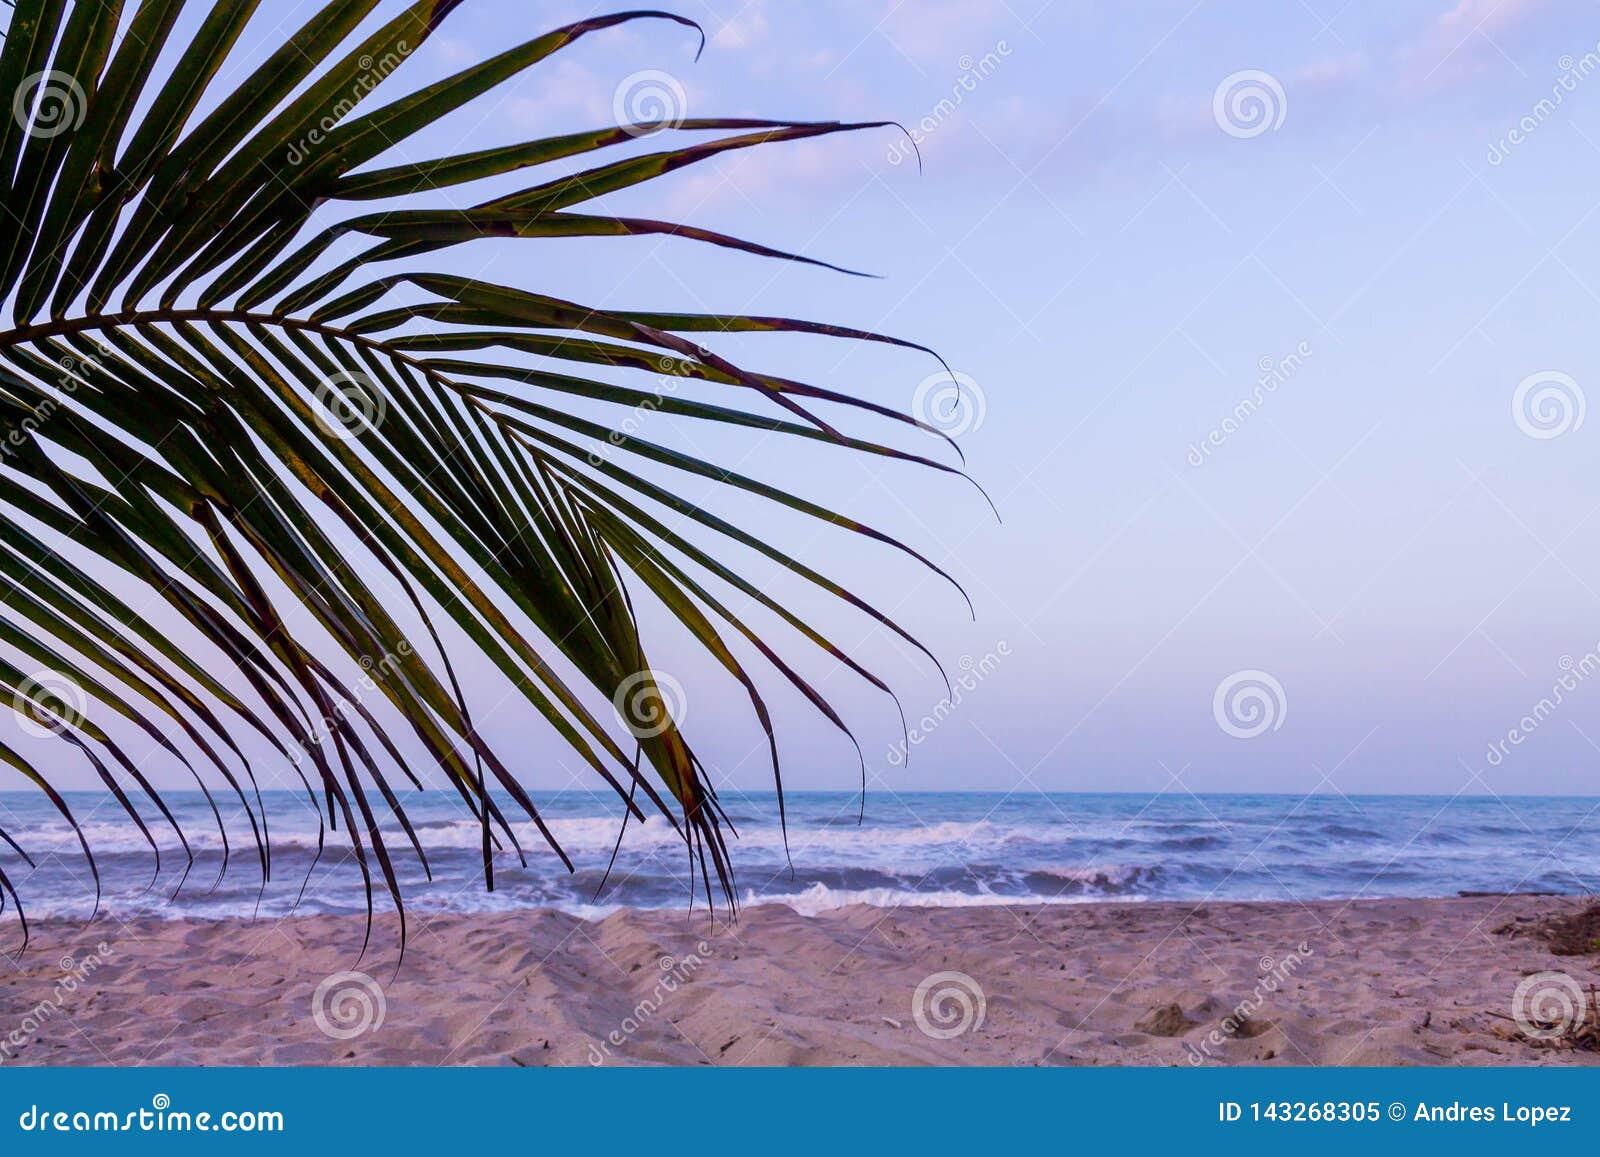 Piasek, słońce i morze w Tayrona parku,